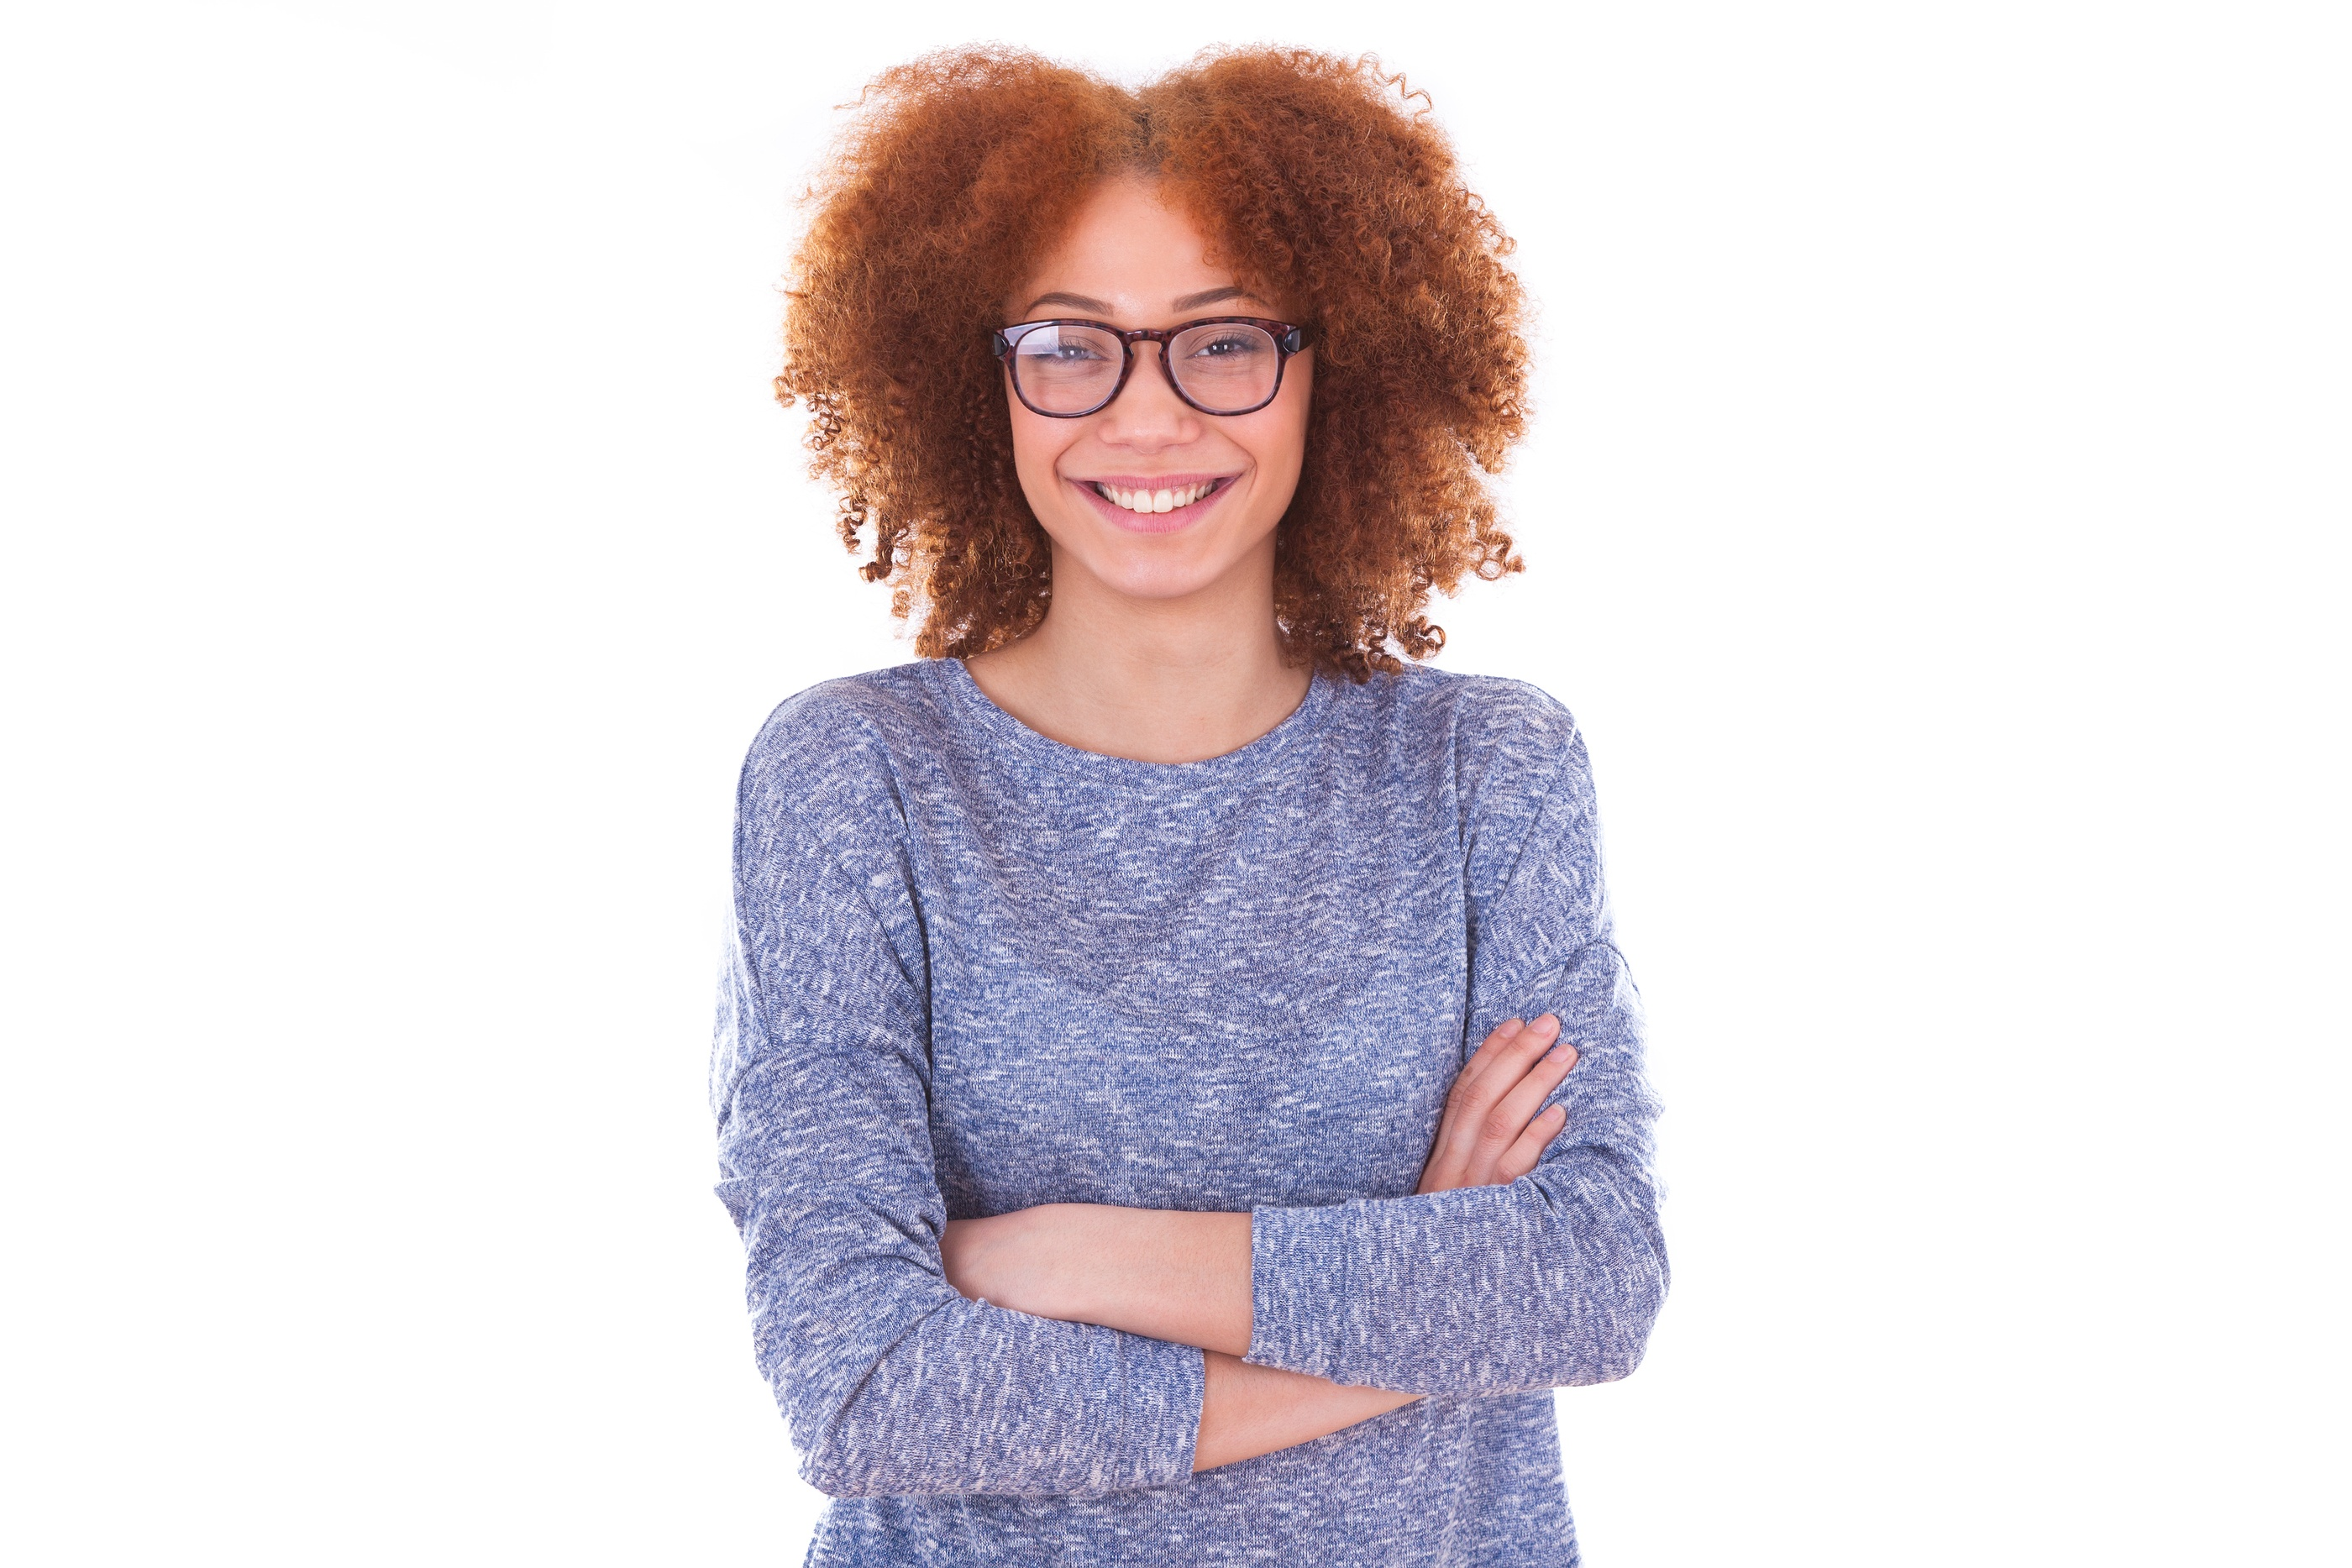 bigstock-Happy-Young-Hispanic-Teenage-G-87678446.jpg